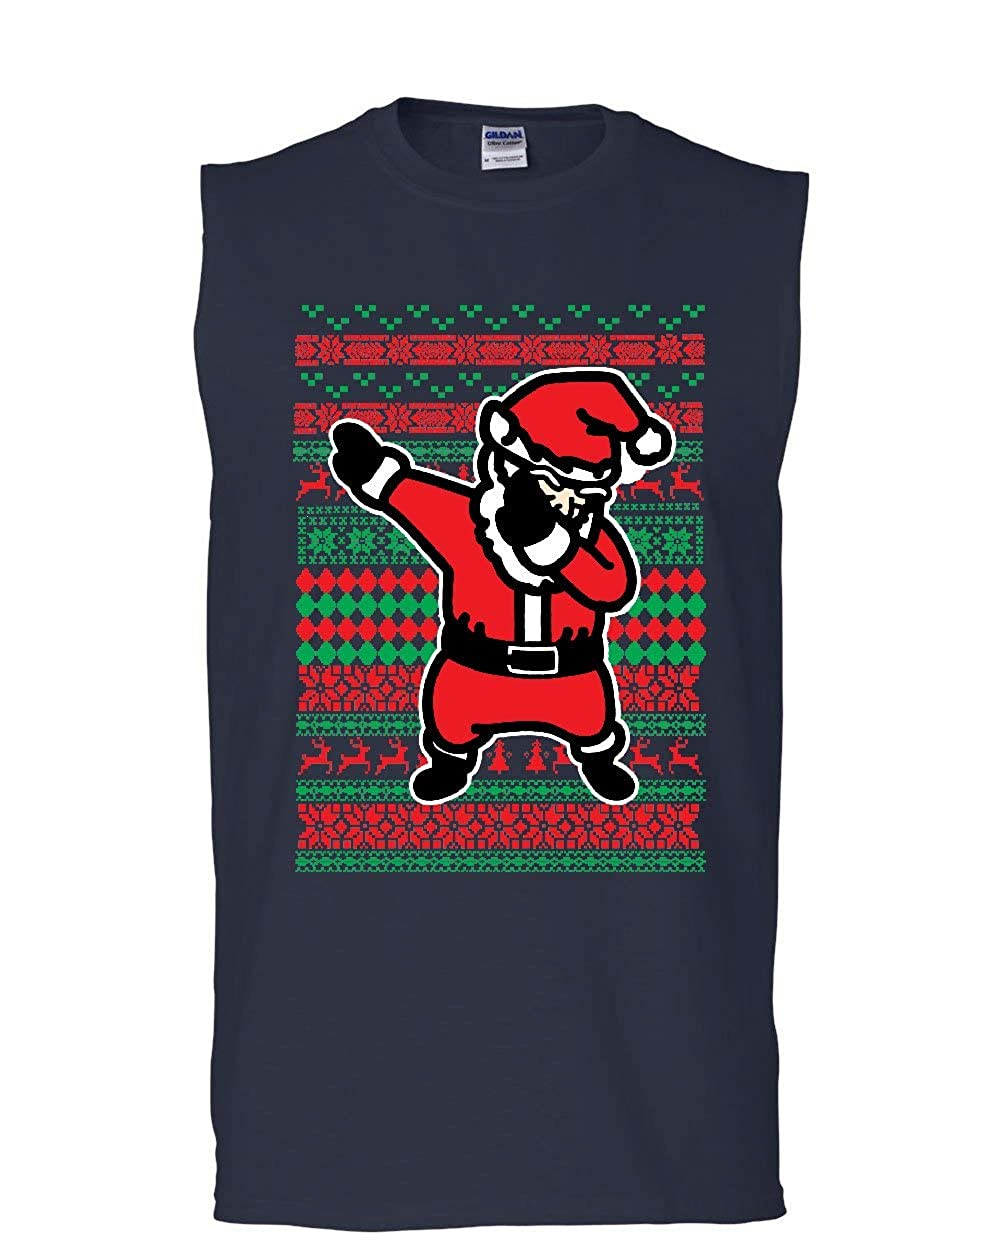 Tee Hunt Santa Dab Dancing Ugly Sweater Muscle Shirt Christmas Xmas Ho Ho Ho Sleeveless